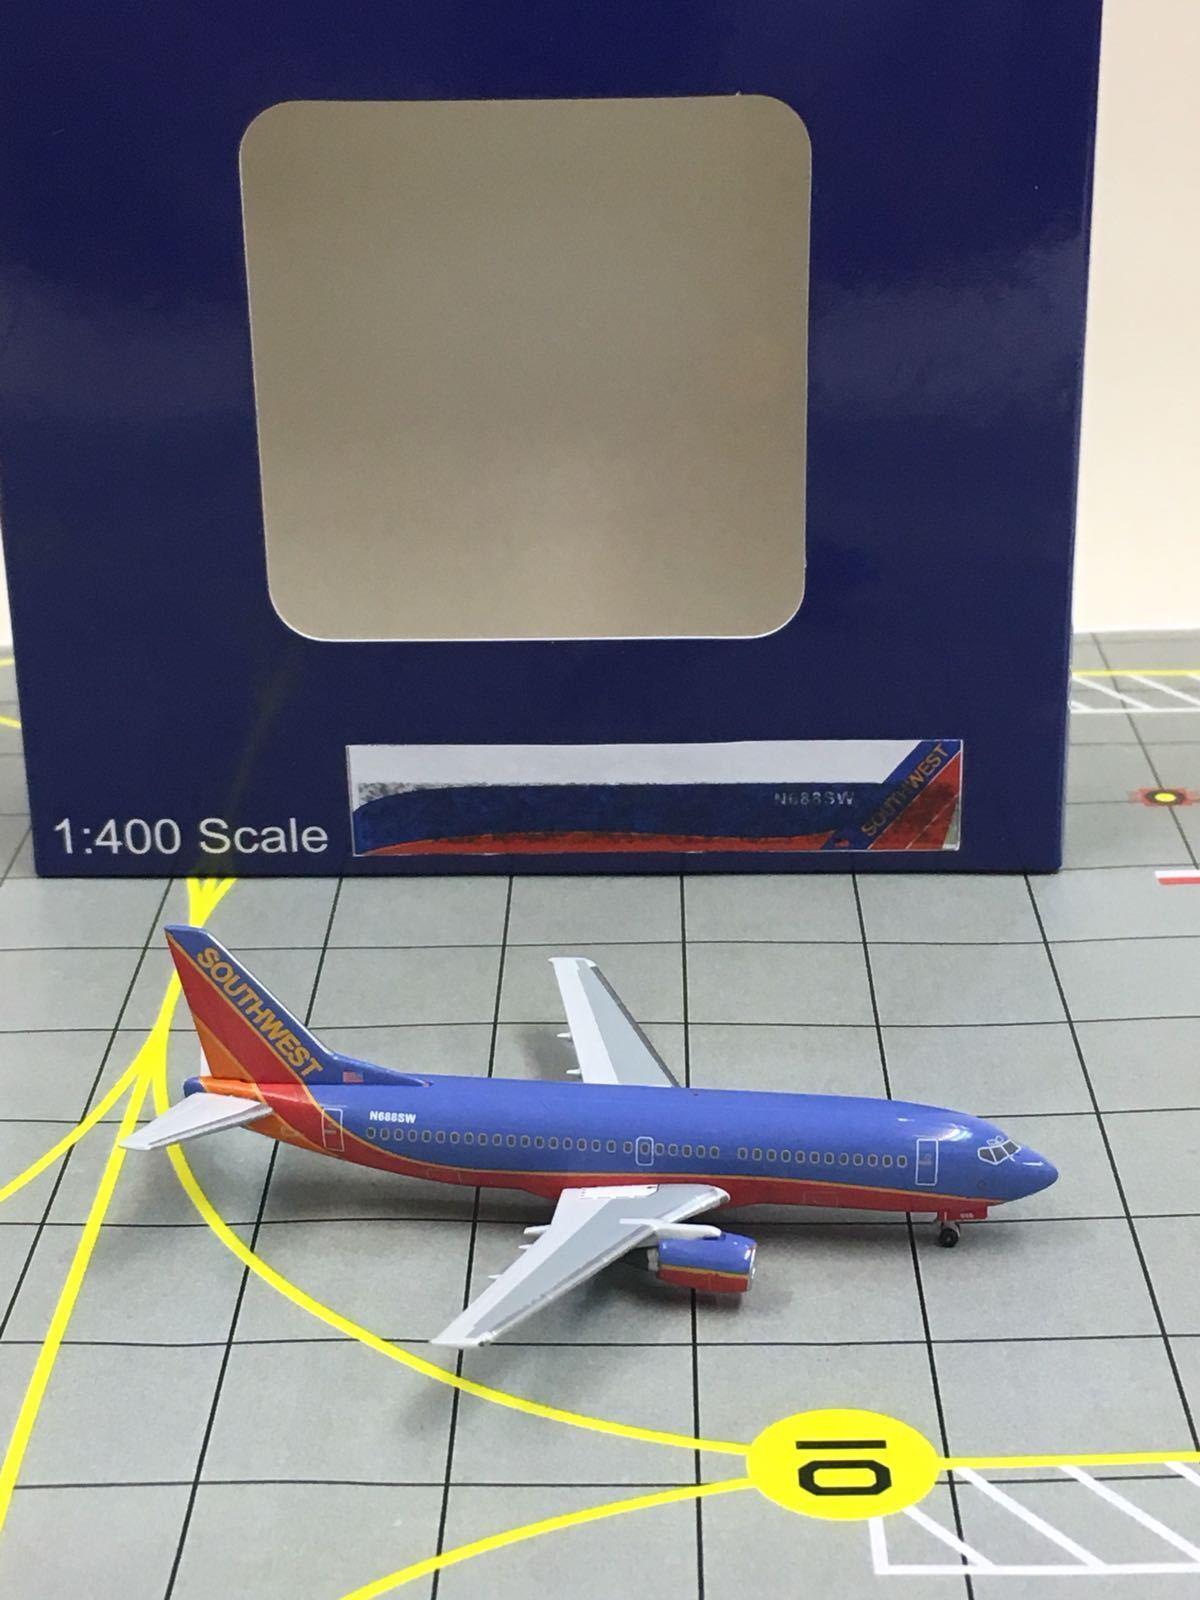 Selten aeroclassics 1 400 southwest airlines boeing 737 - 300 n688sw